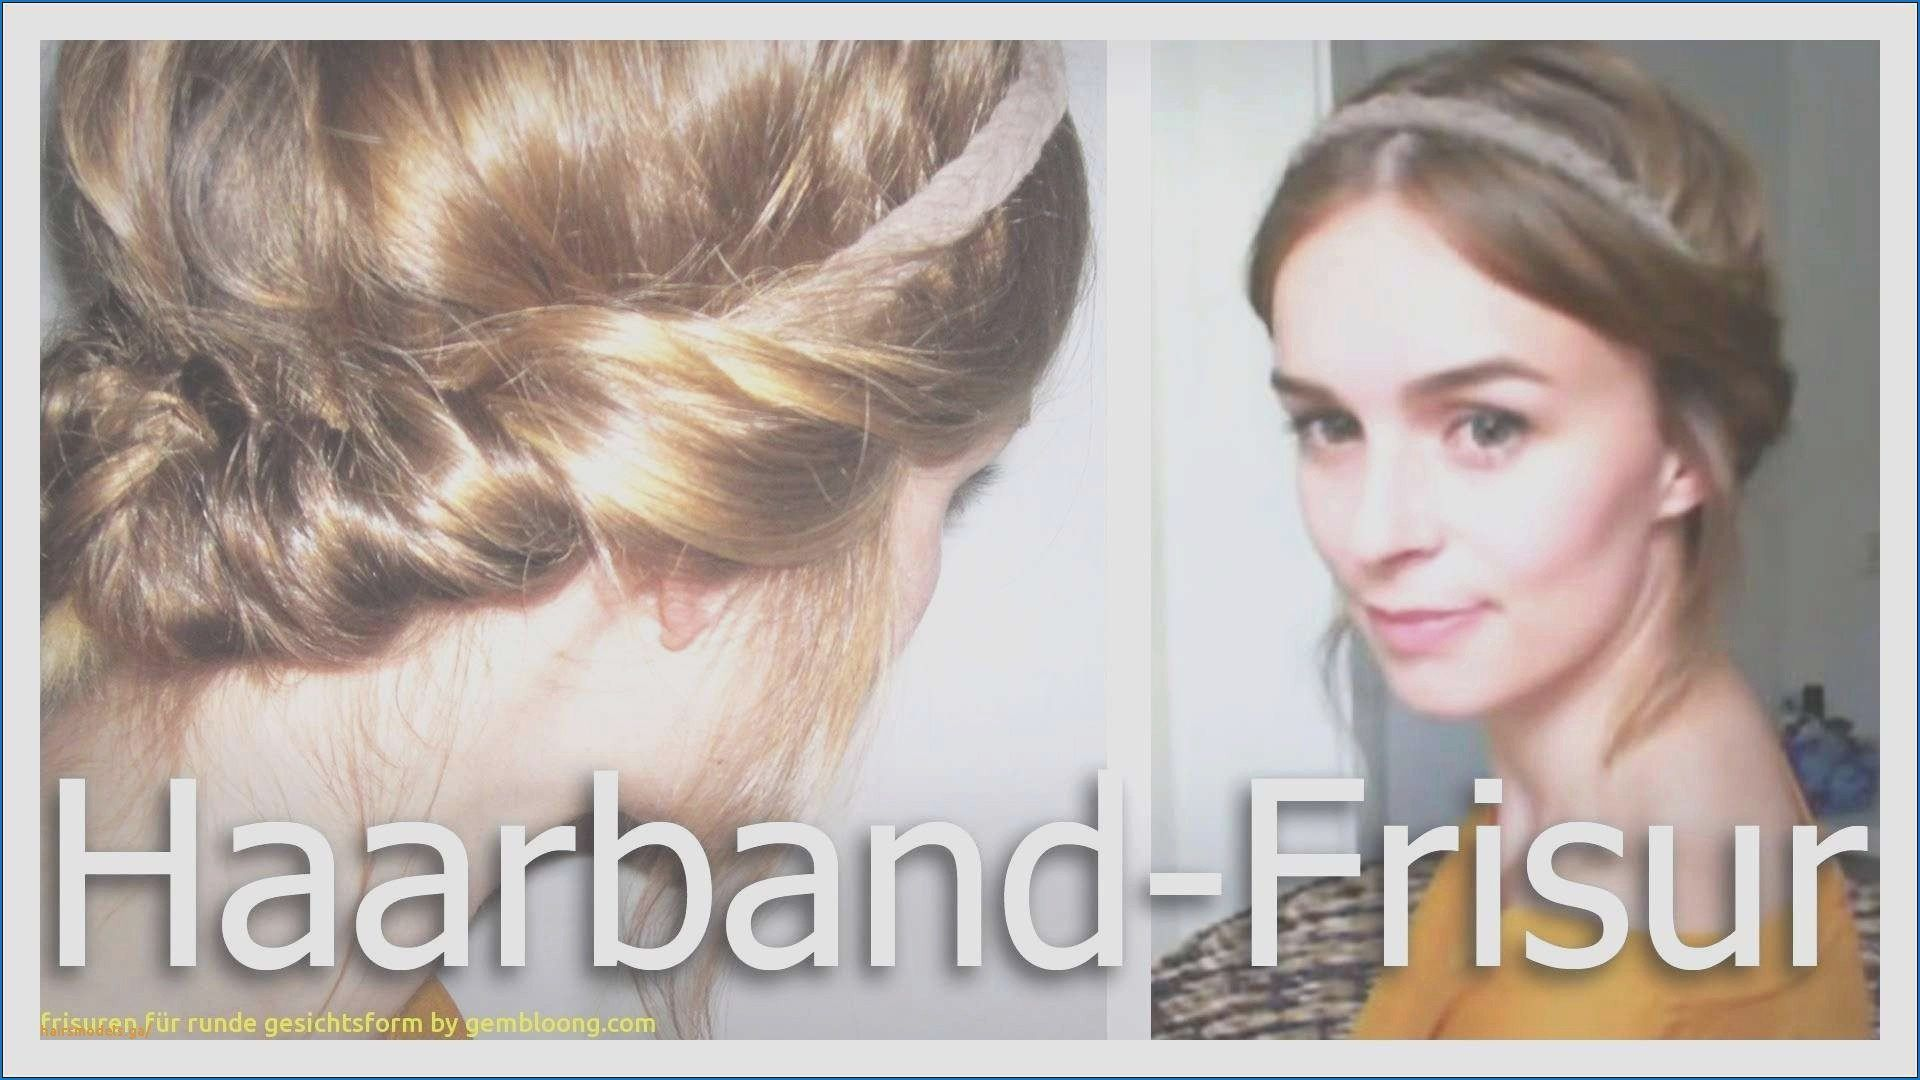 Coole Frisuren Fur Kurze Haare Frauen Women Haare Jull Cool Frauen Fri Dirndl Frisuren Kurze Haare Haarband Frisur Mittellange Haare Frisuren Einfach